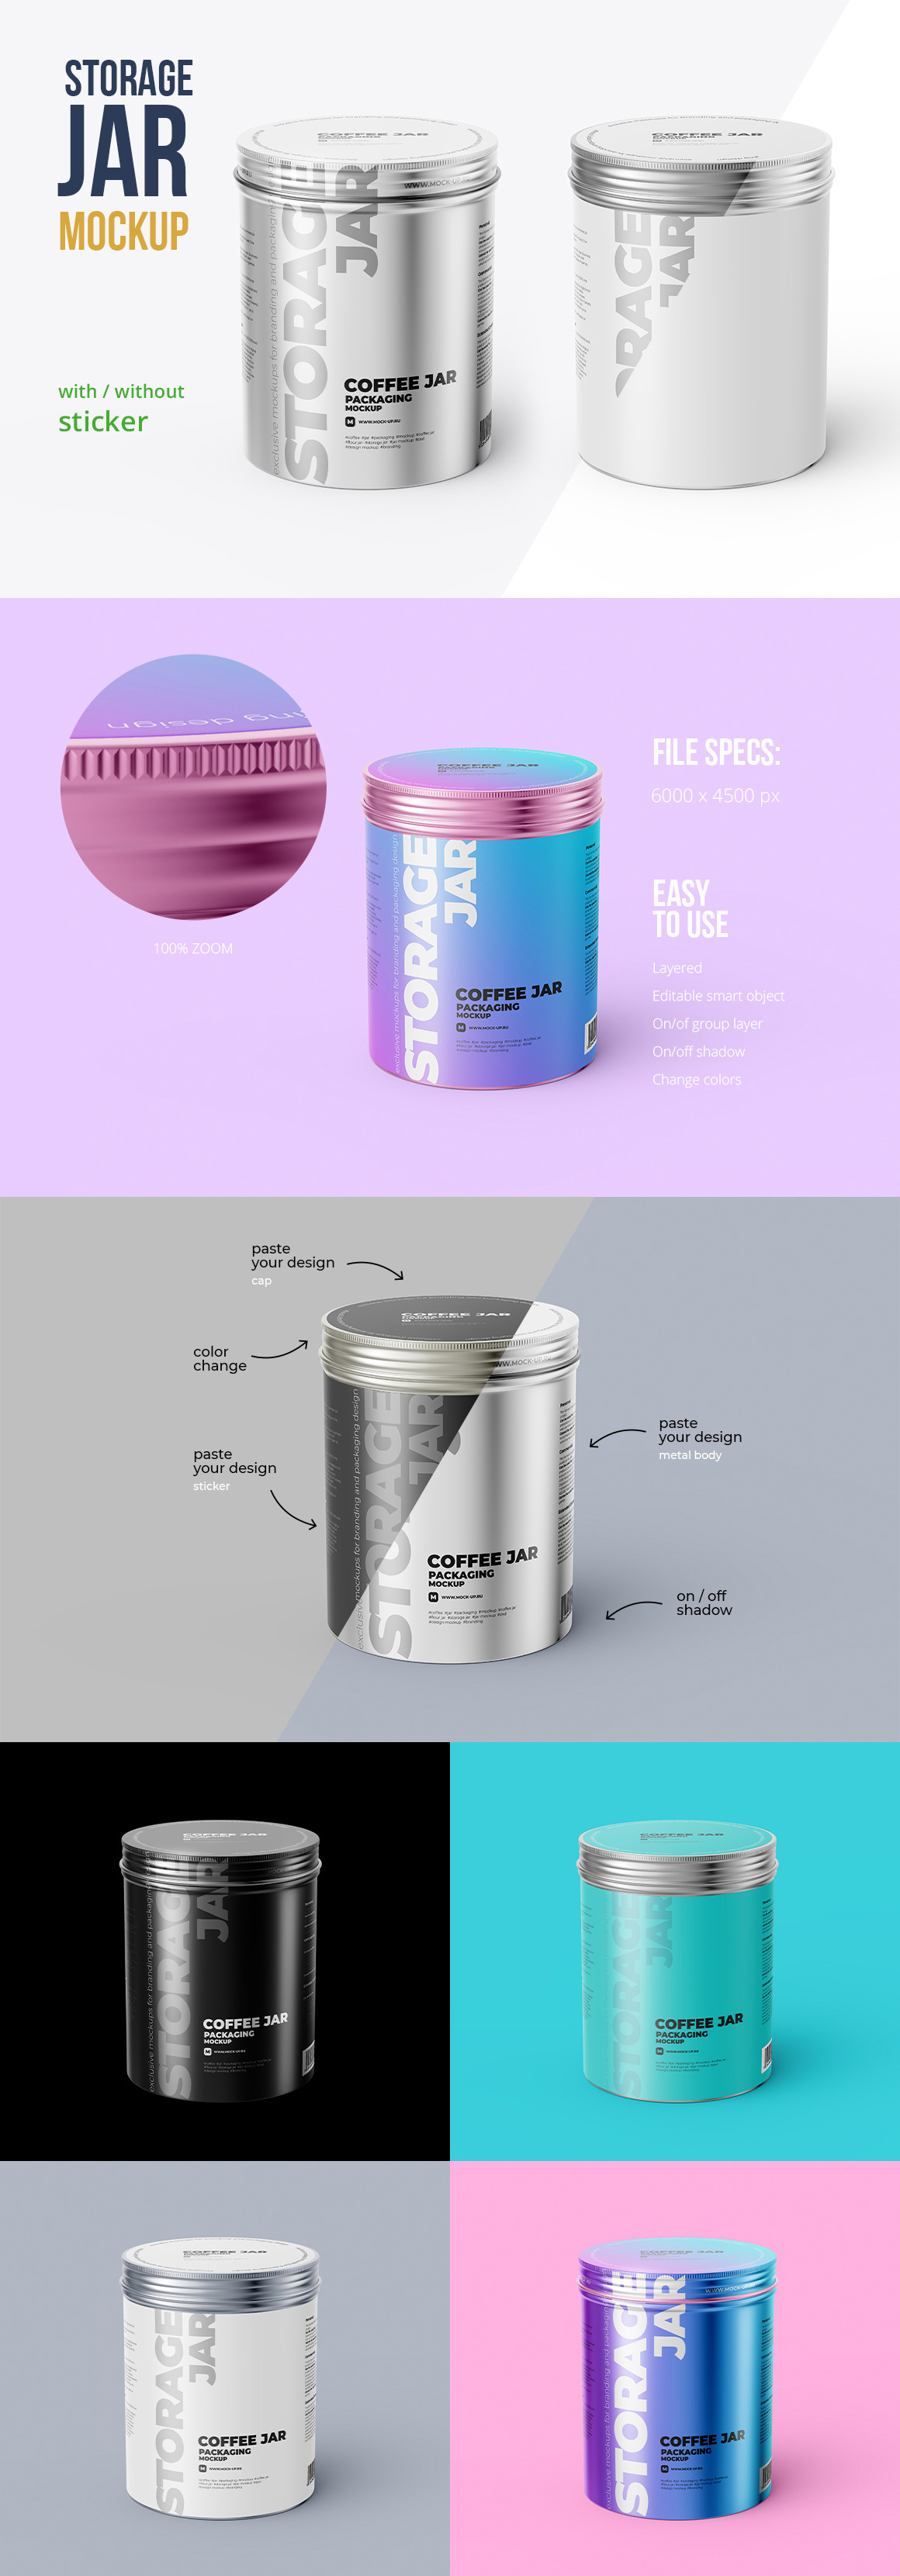 Metallic Storage Jar. Angle view 2 PSD